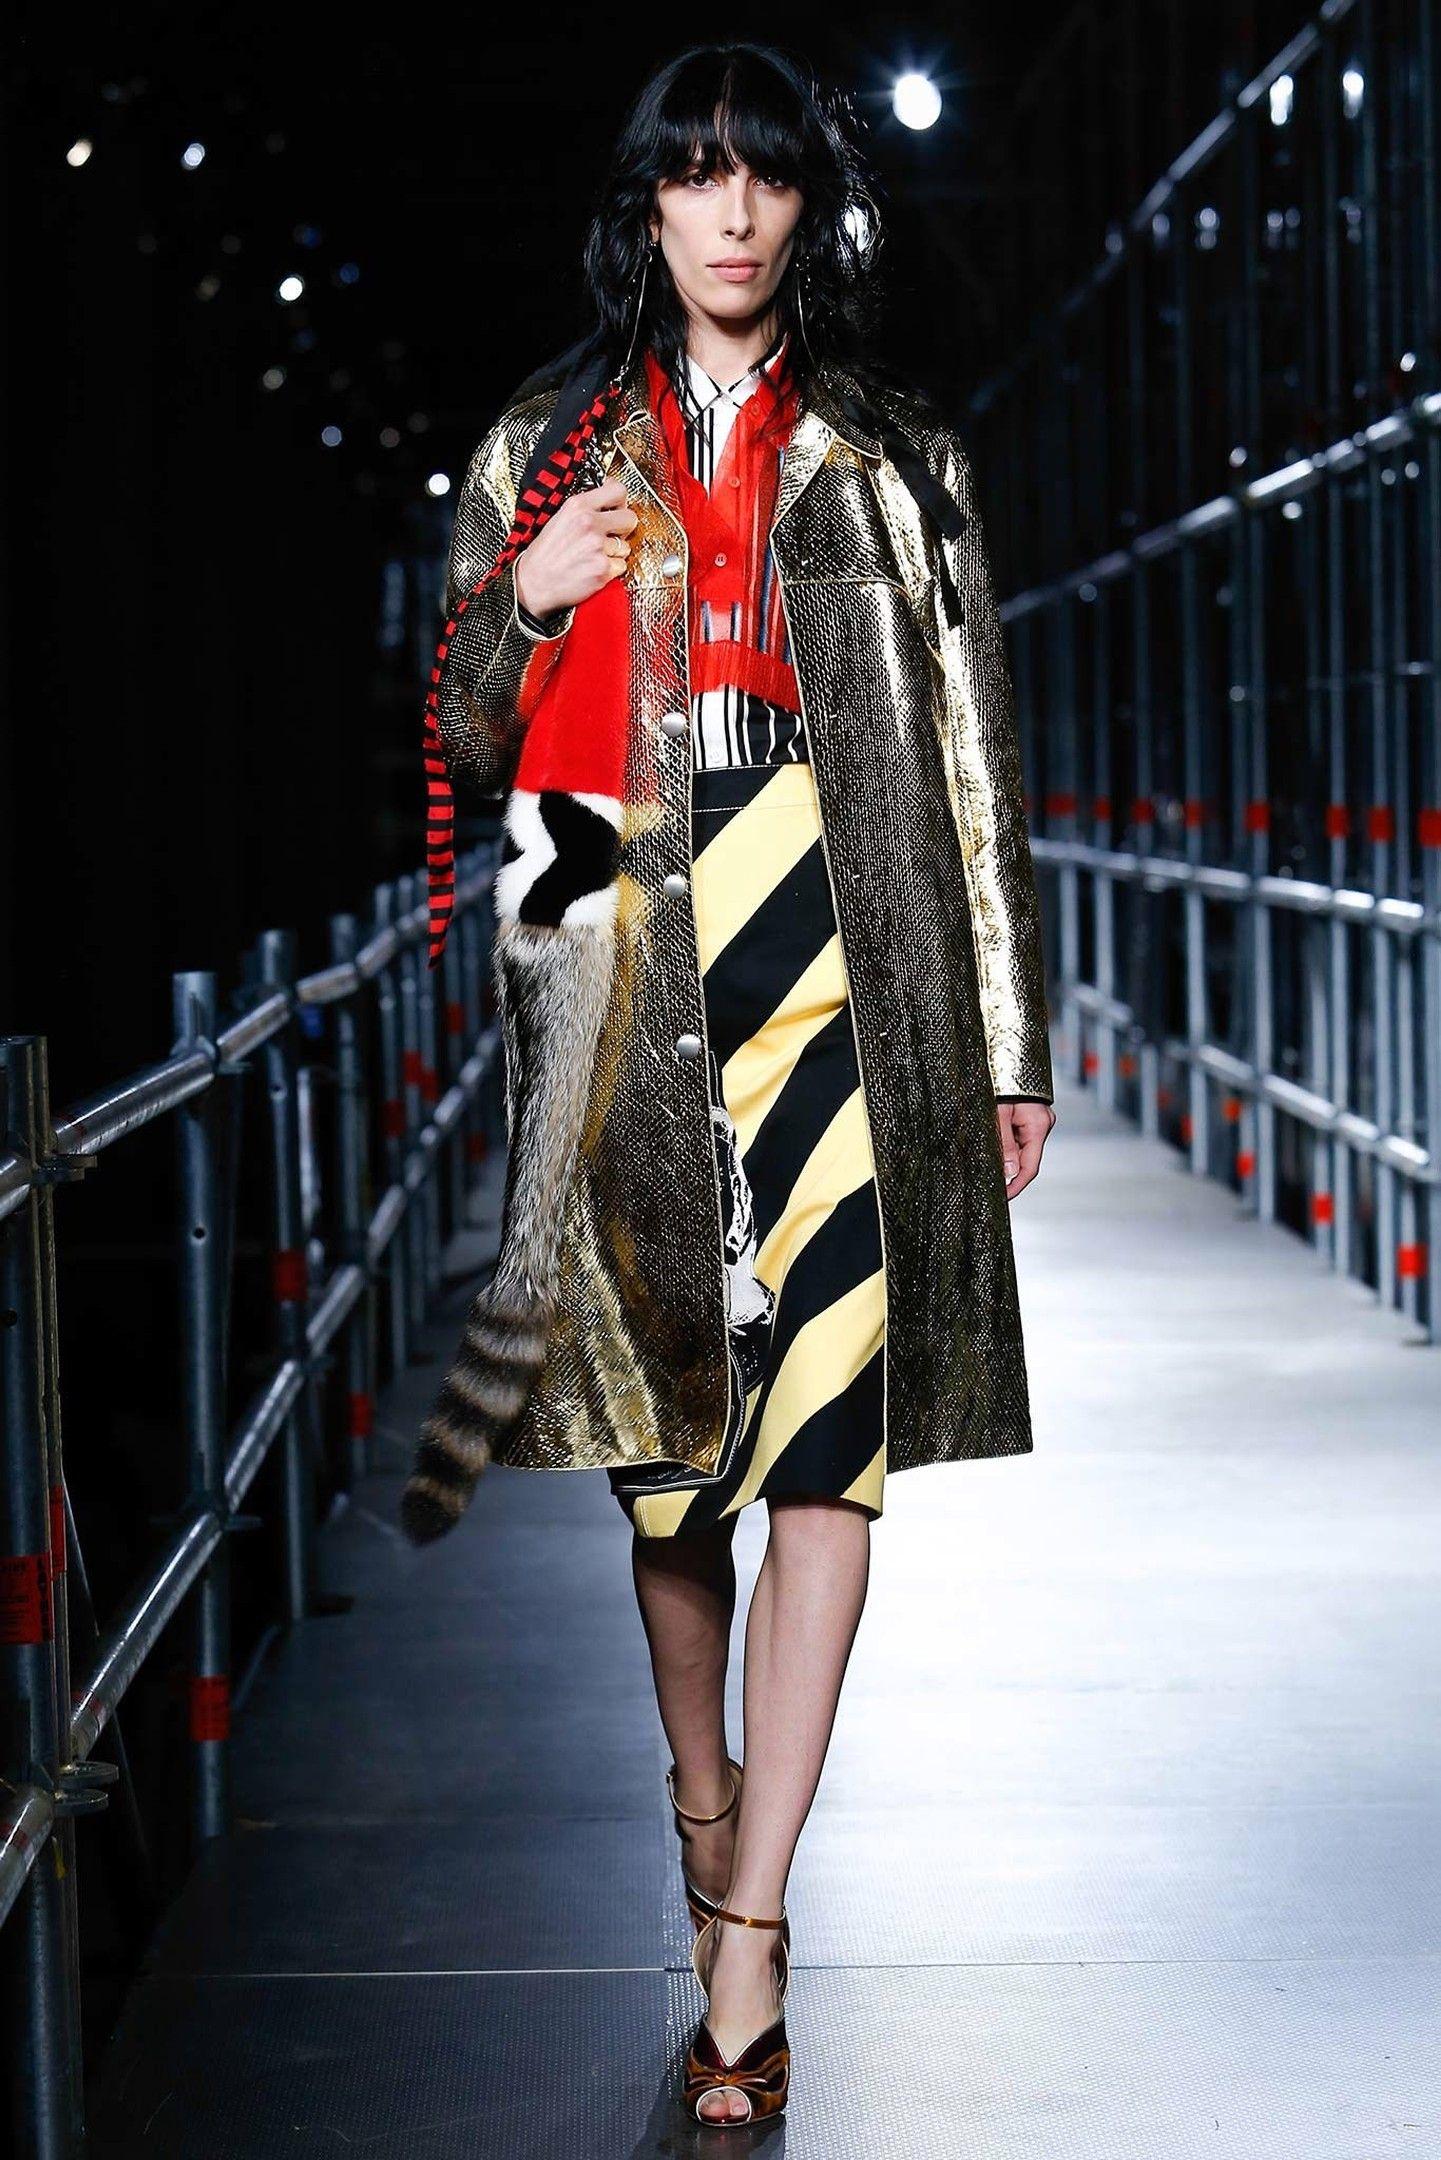 e7df3d3c808 mytheresa.com - Striped A-line denim skirt - Luxury Fashion for Women    Designer clothing, shoes, bags